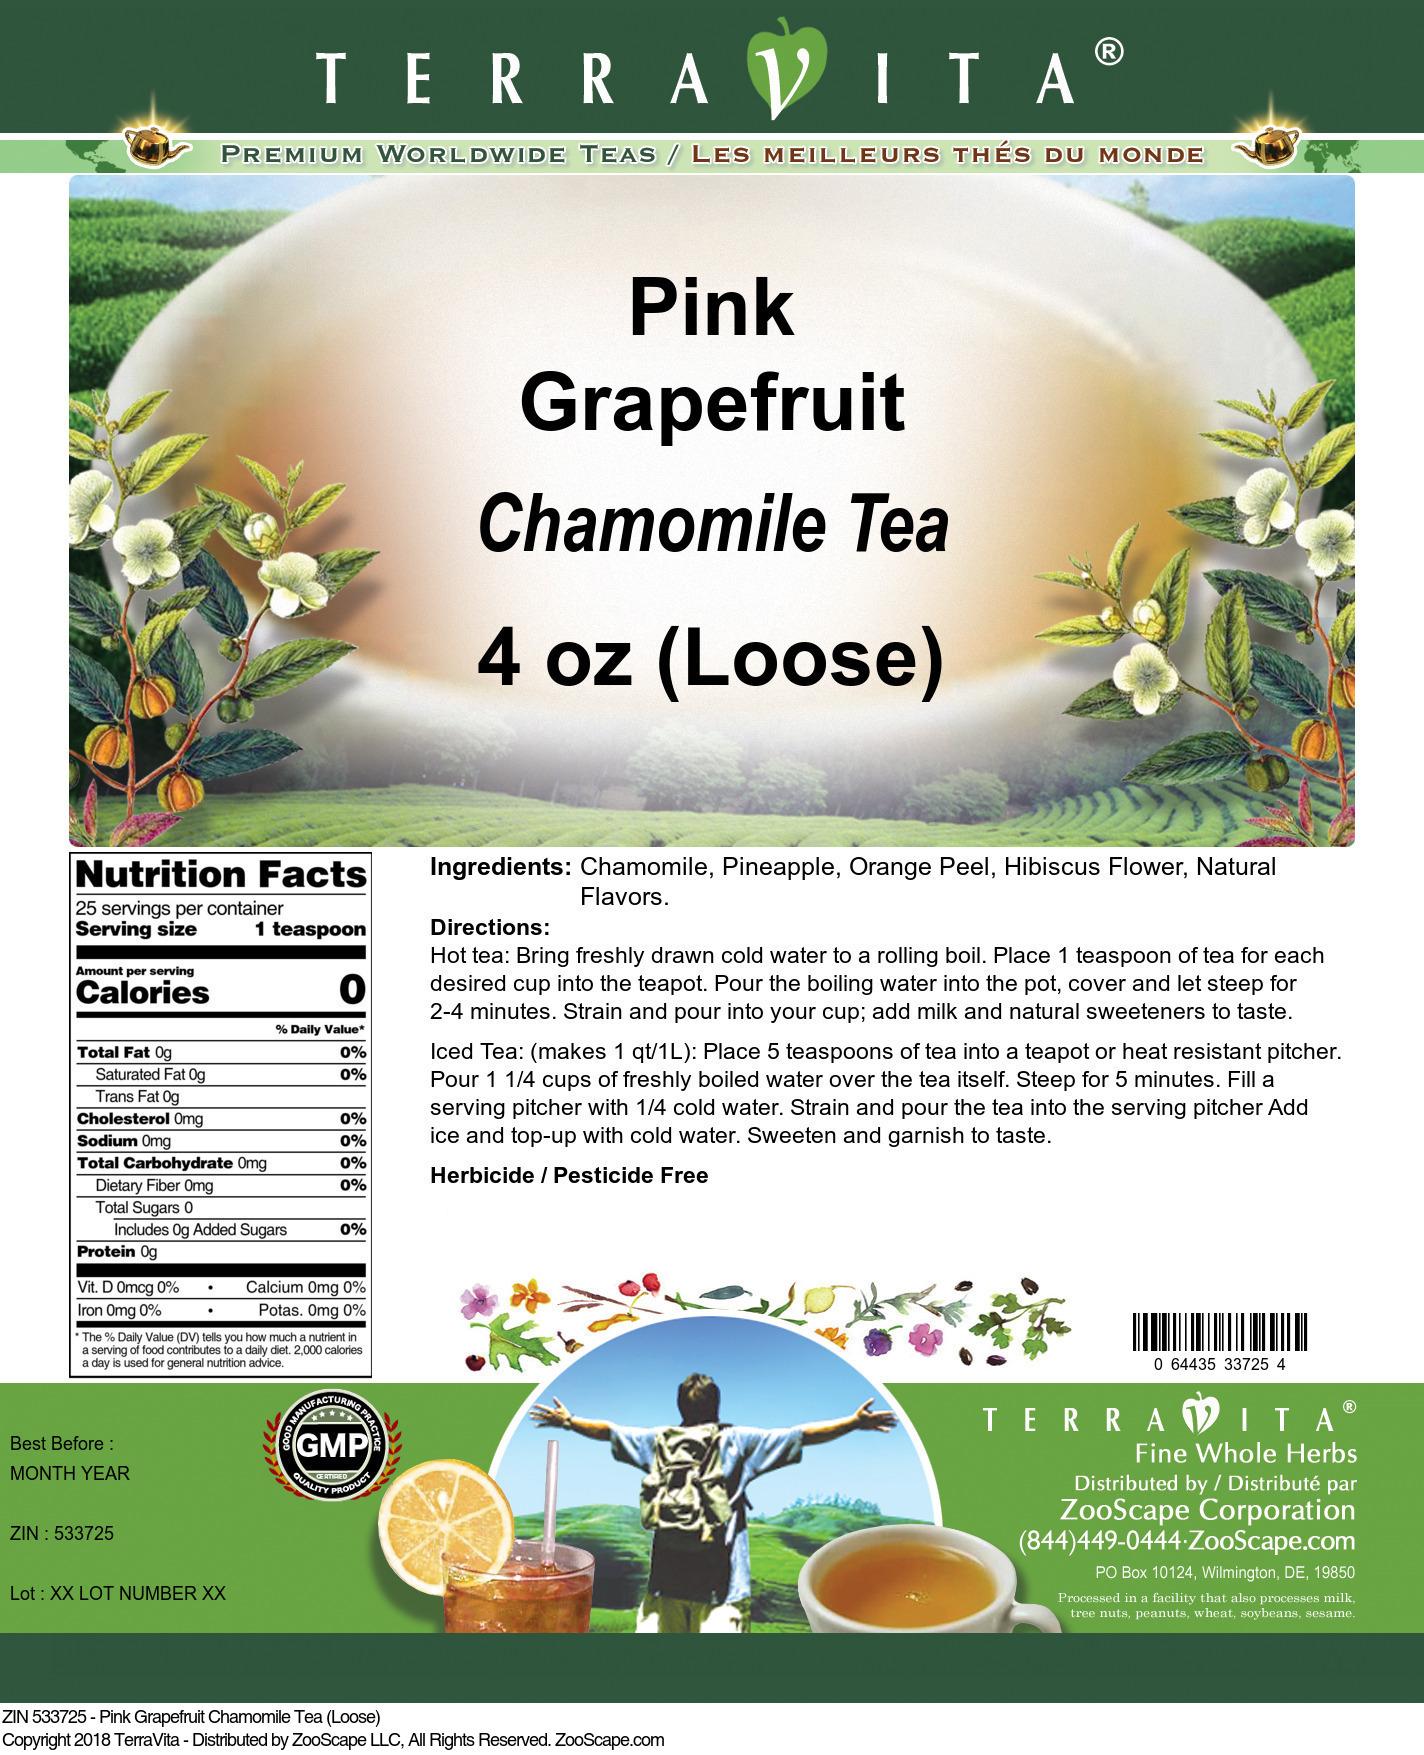 Pink Grapefruit Chamomile Tea (Loose)